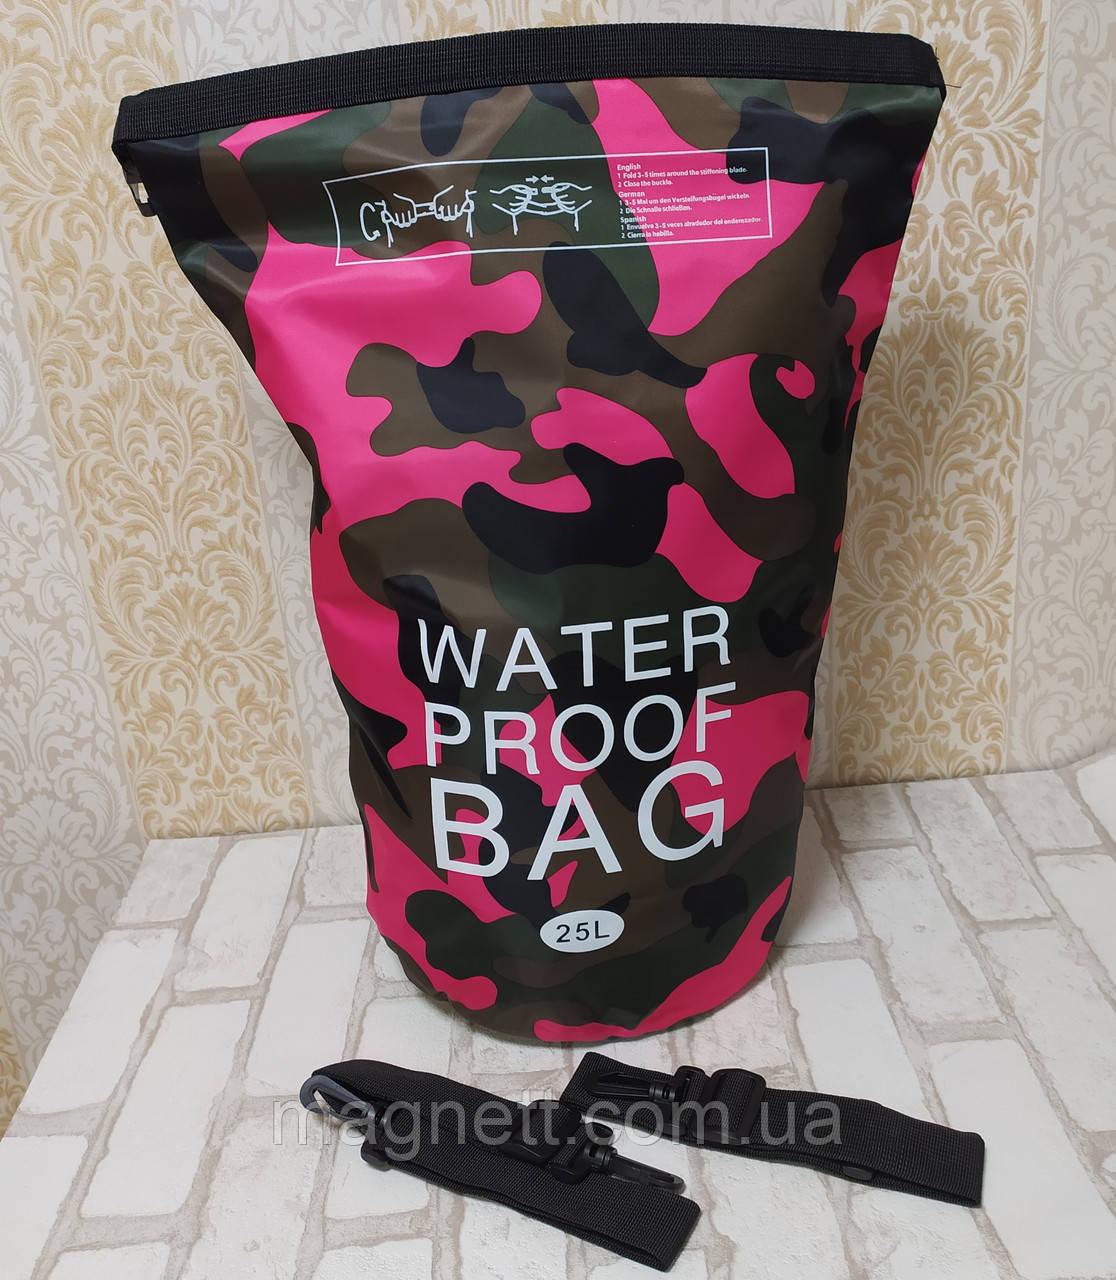 Водонепроницаемая сумка с плечевым ремнем Water proof Bag 25л